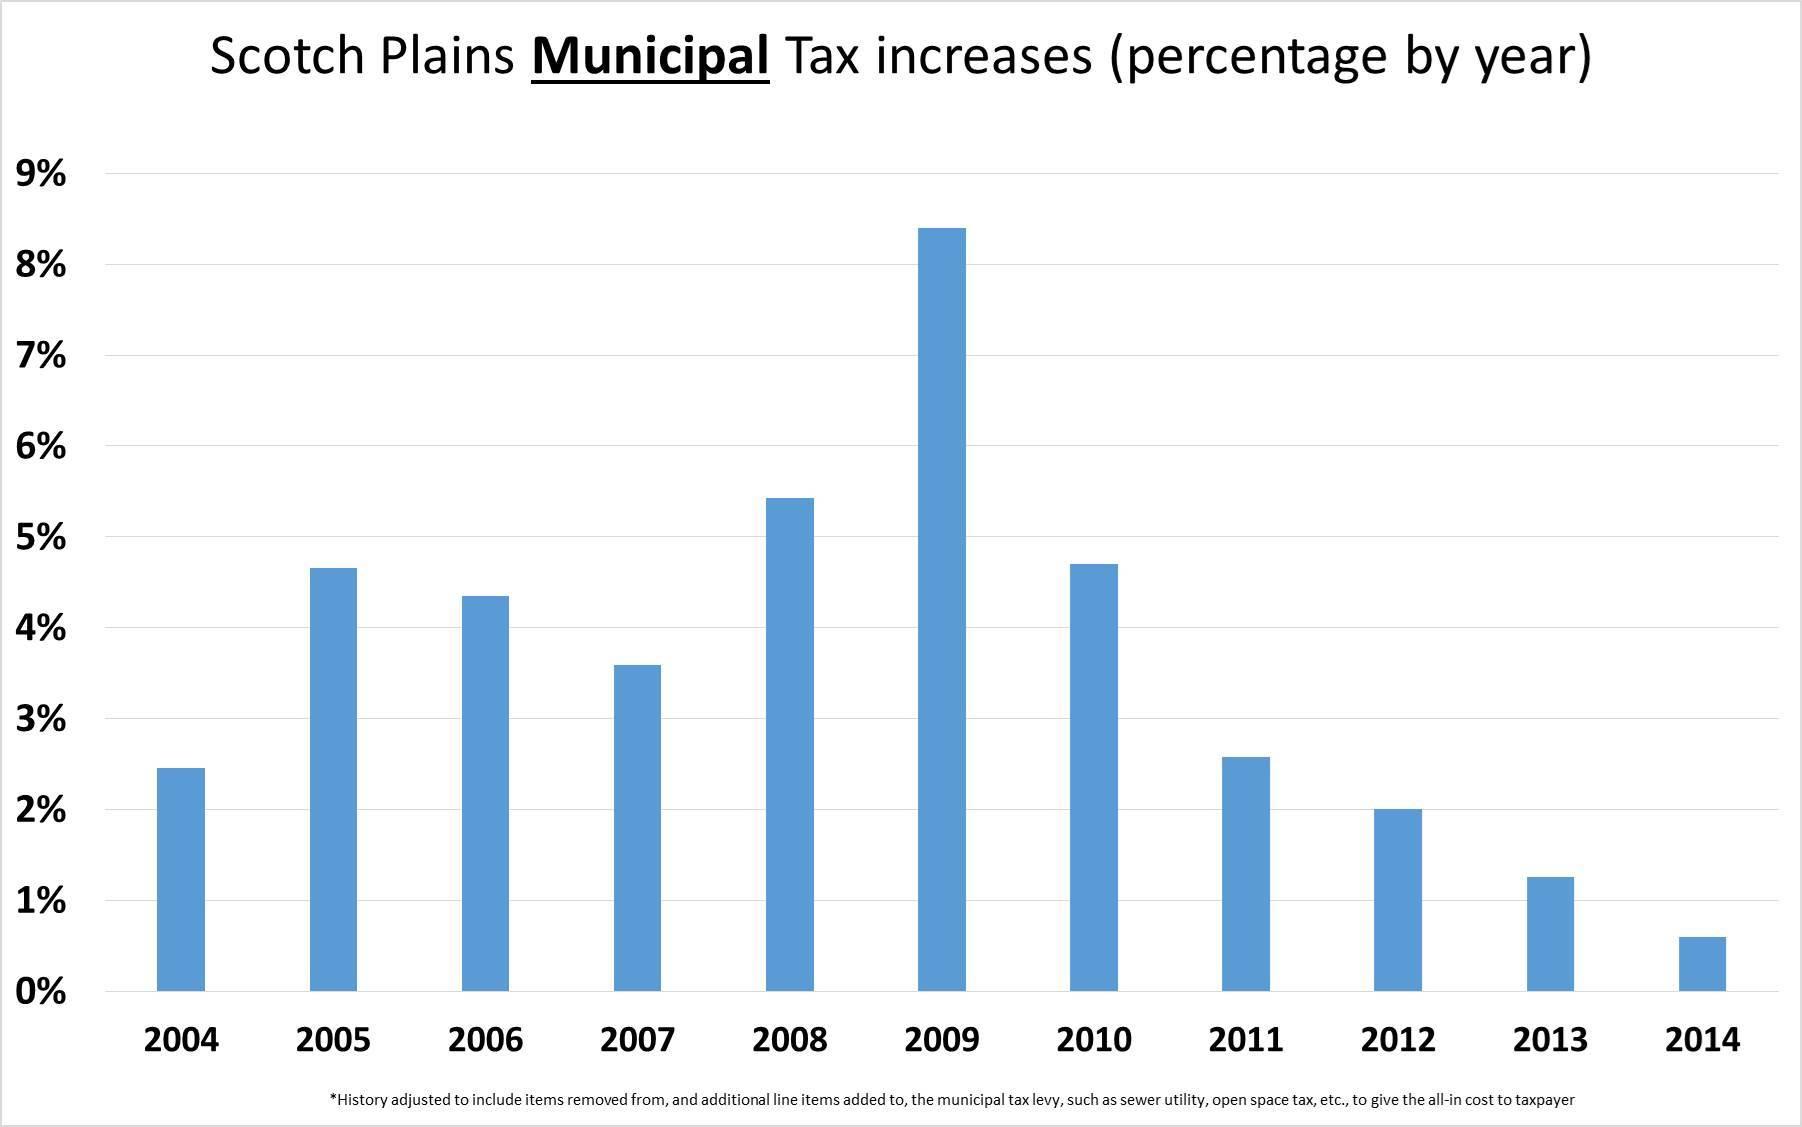 95b870550b9fa387ac21_LJ_Municipal_Tax_increases_by_year.jpg